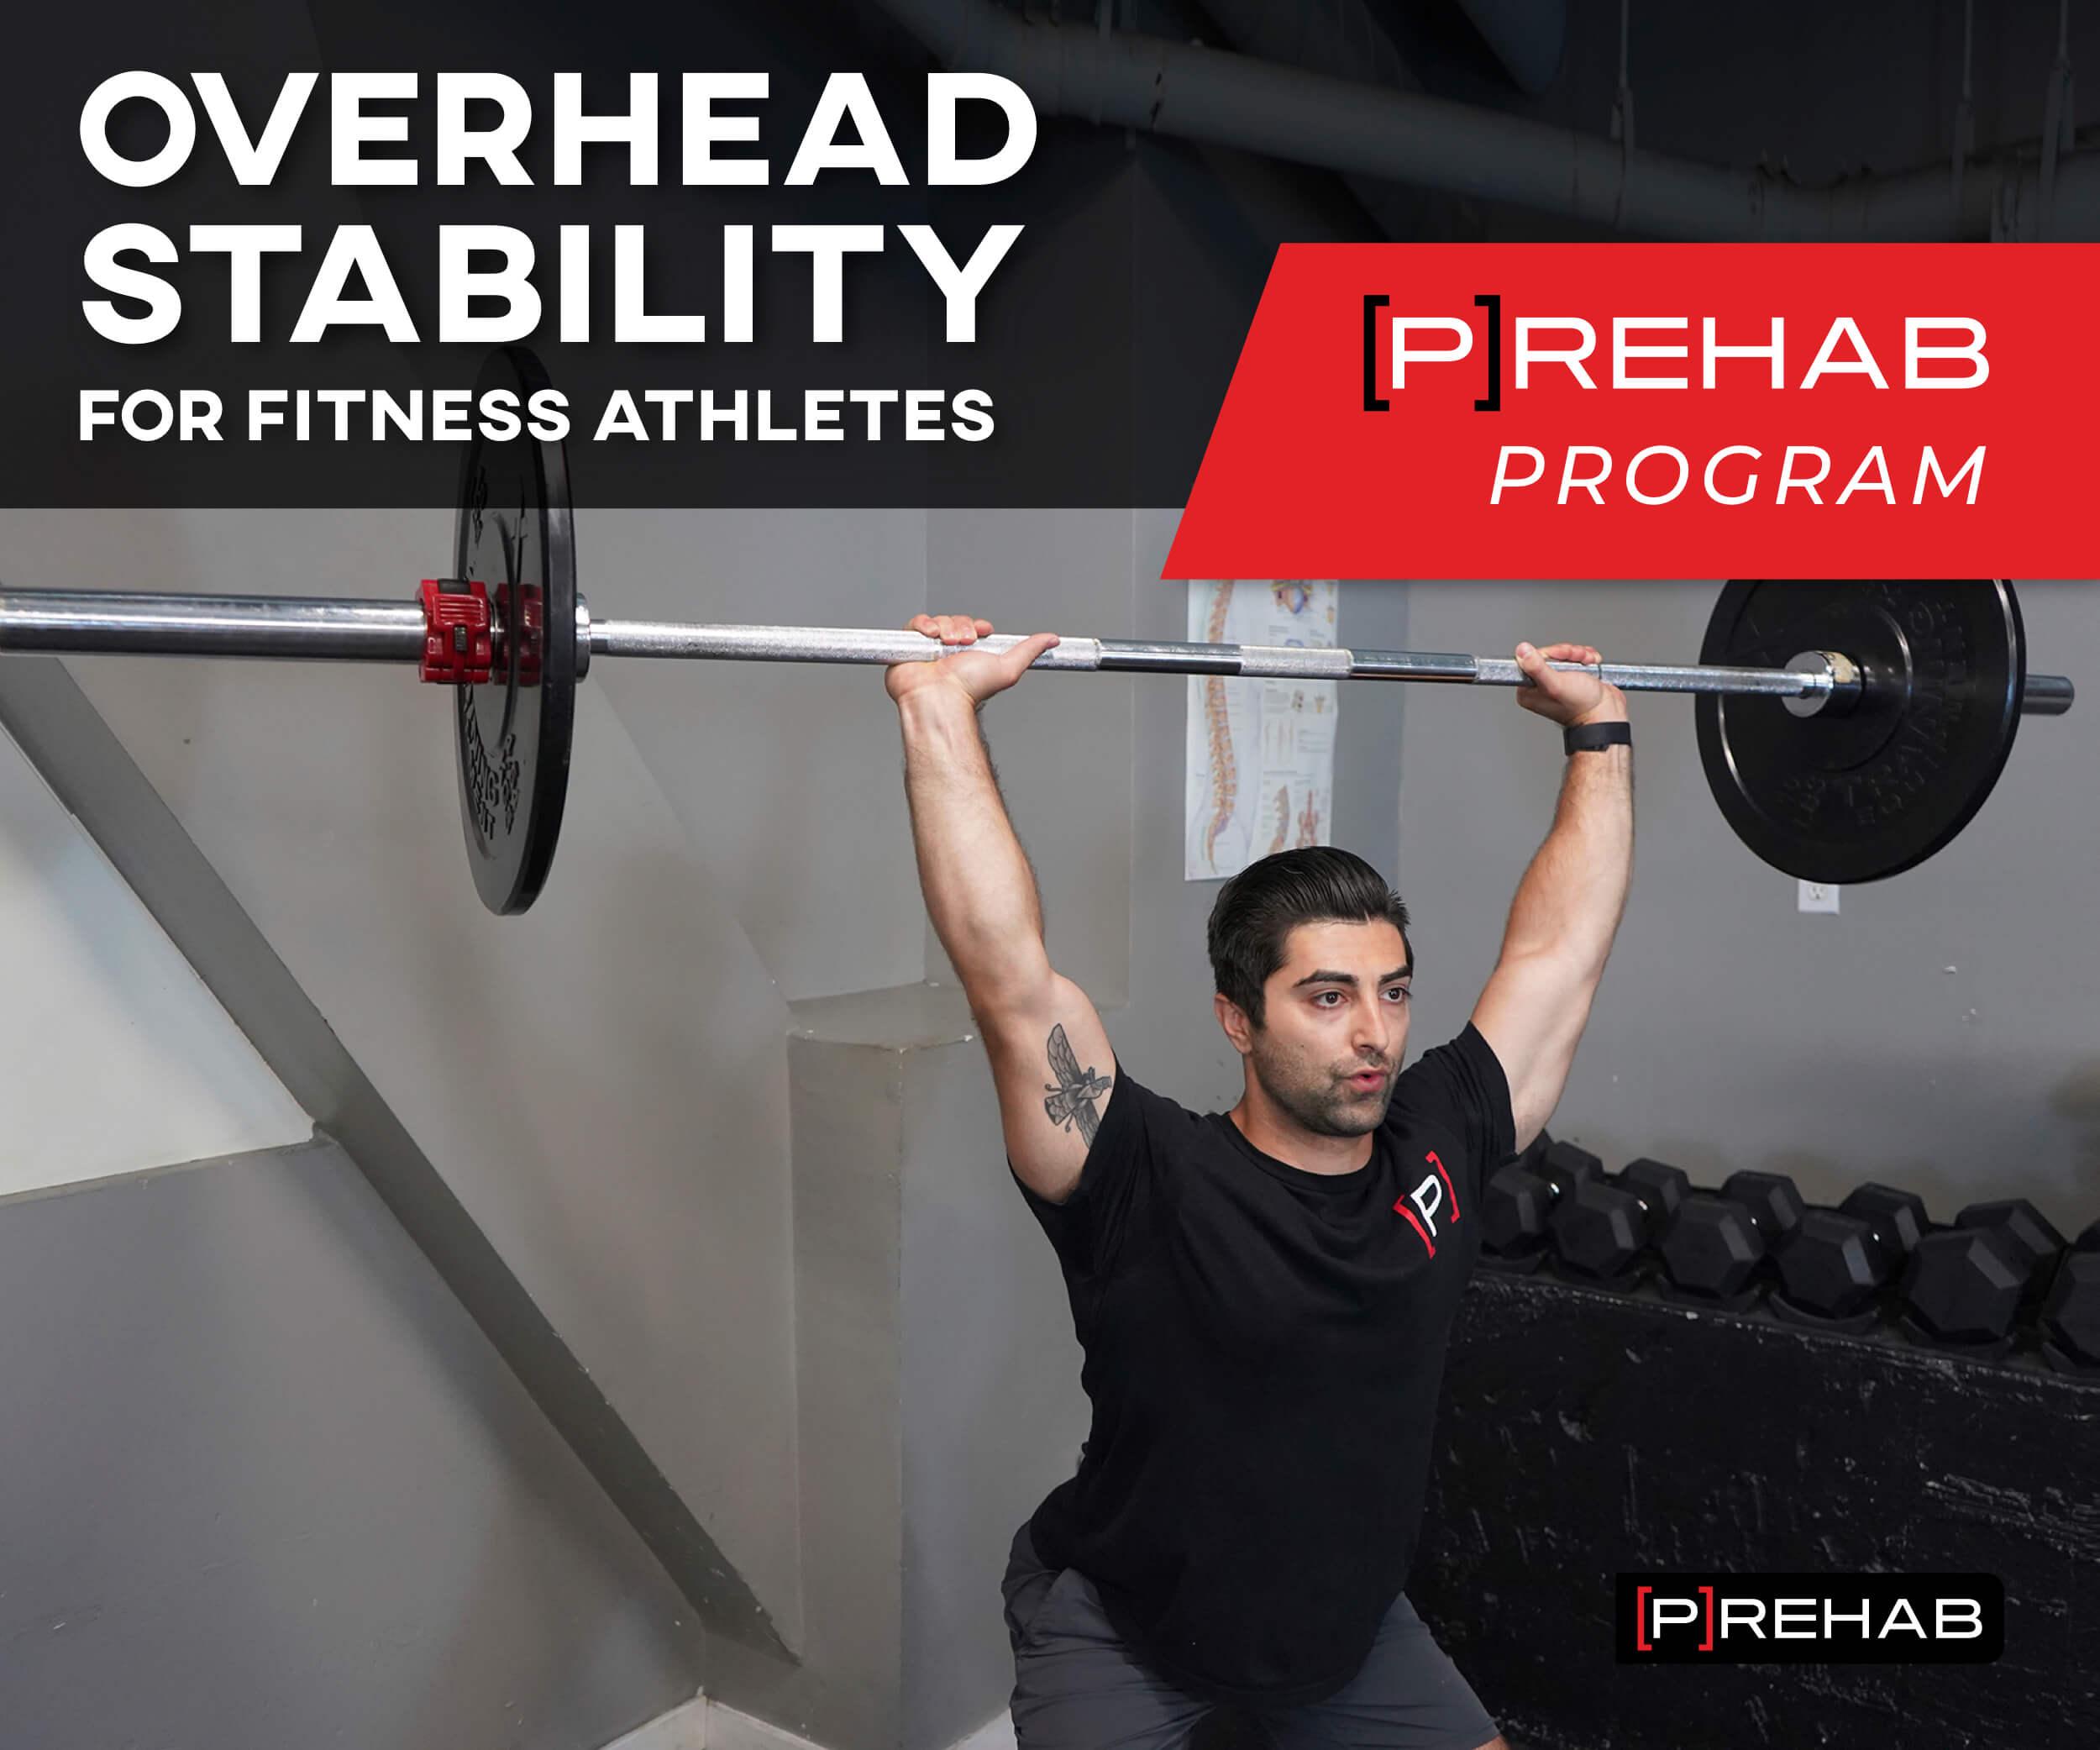 overhead stability fitness athletes prehab guys